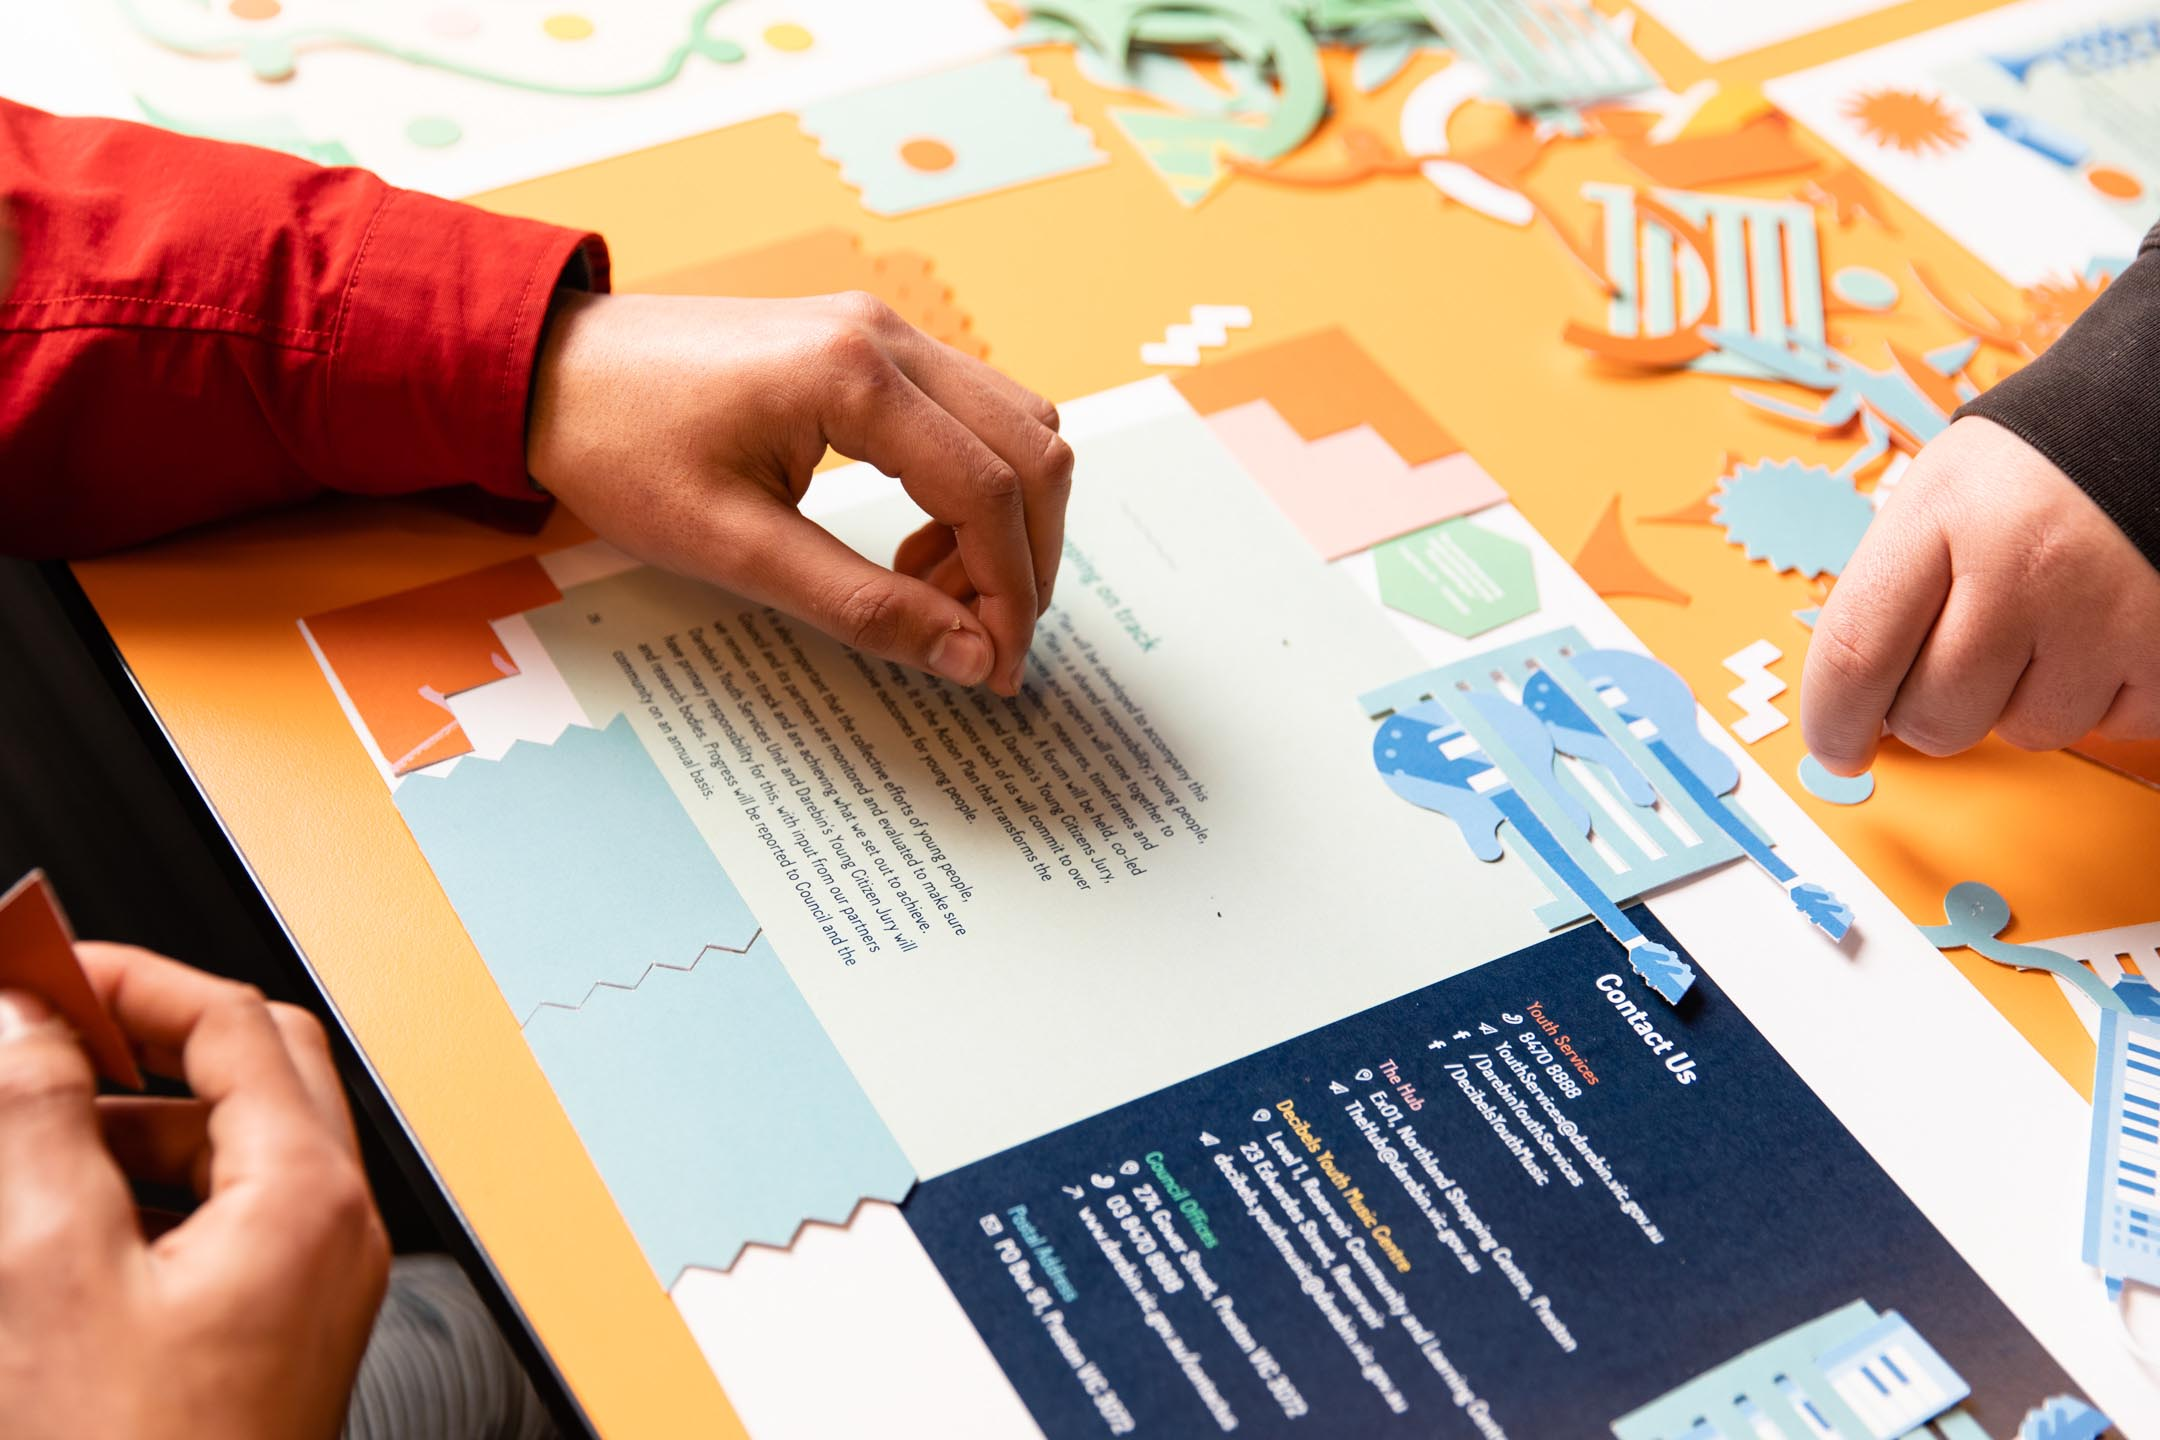 public-journal-strategy-doc-workshop-4